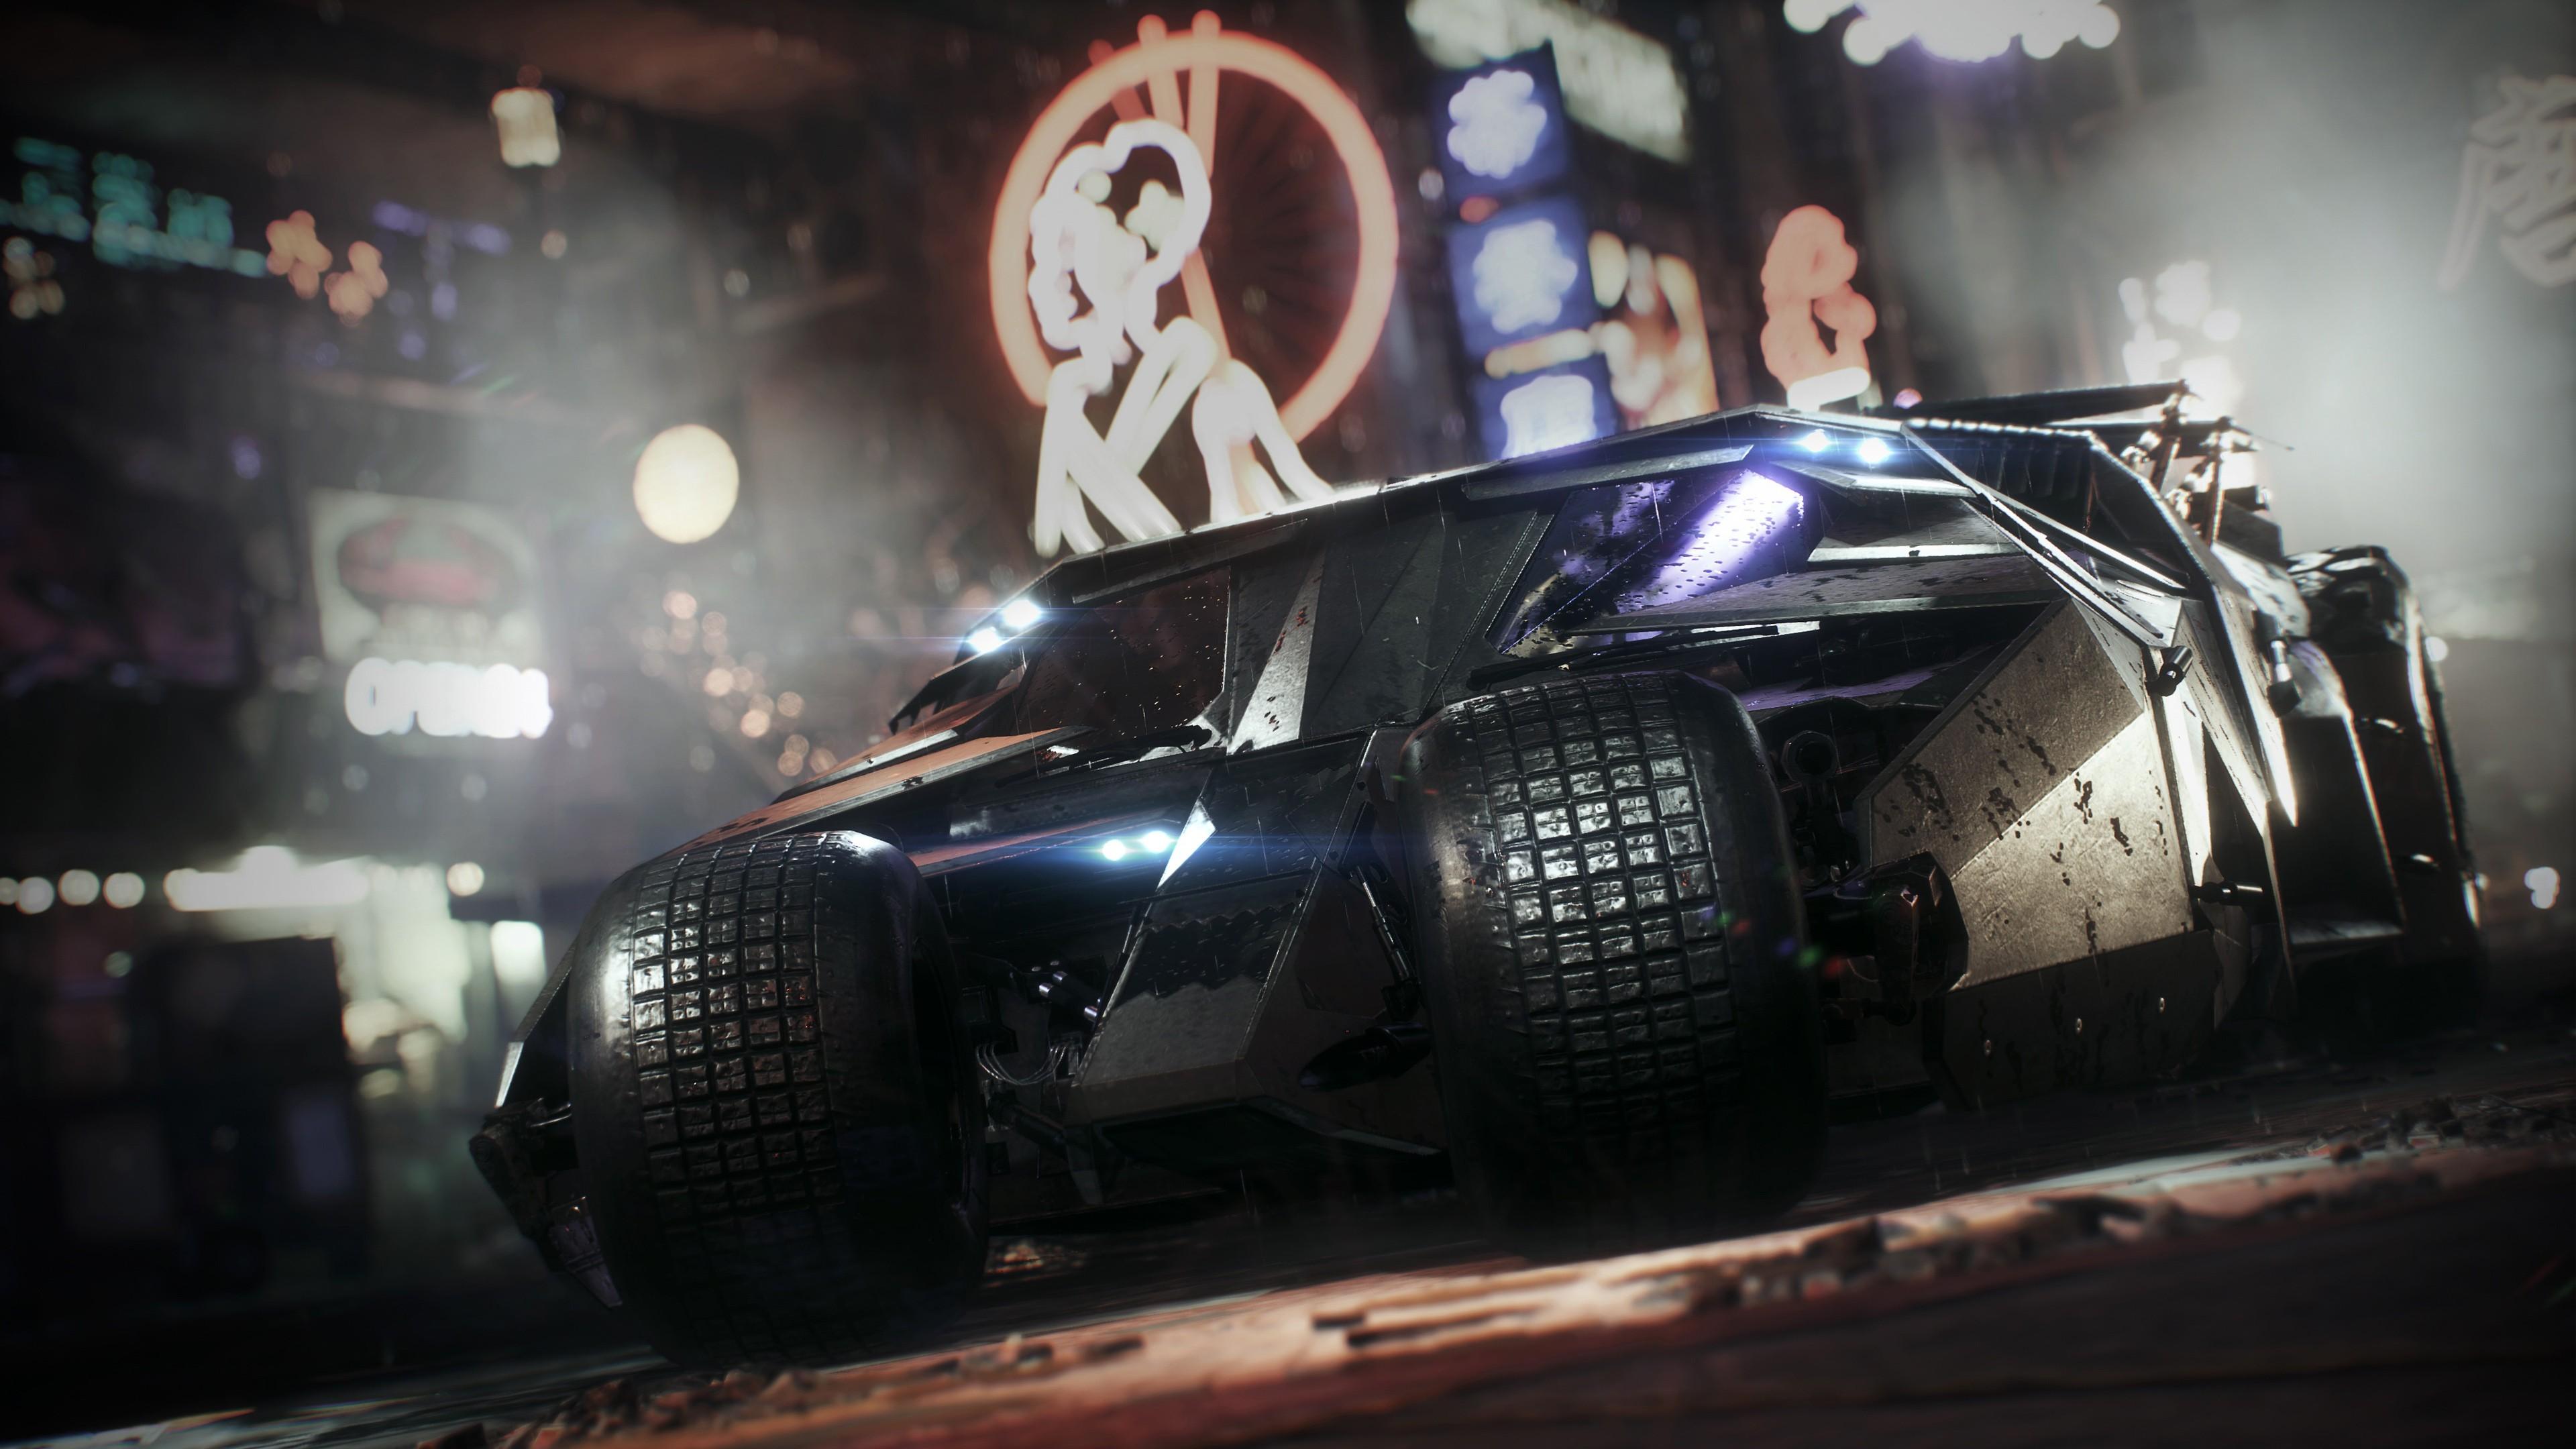 Batman Arkham Knight Car Wallpaper Batman Tumbler Batmobile 4k Wallpapers Hd Wallpapers